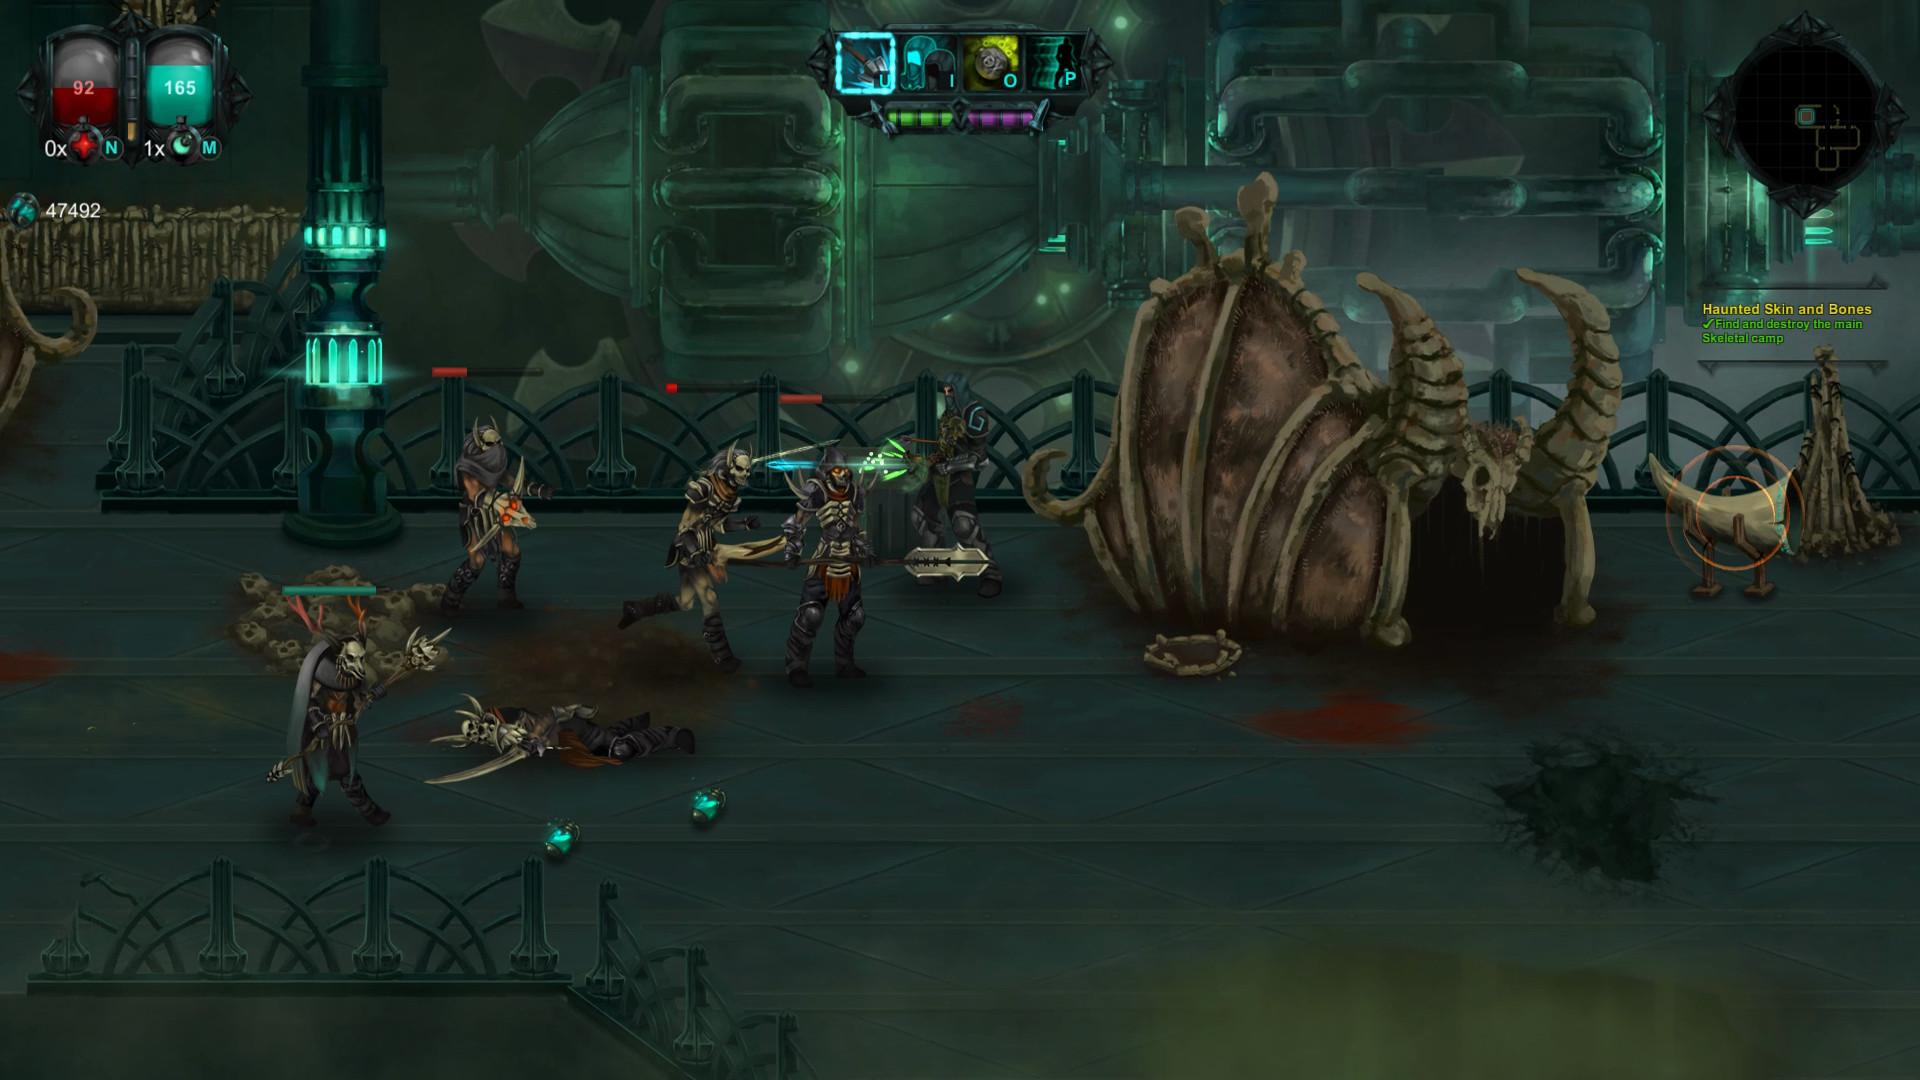 Moonfall Screenshot 1